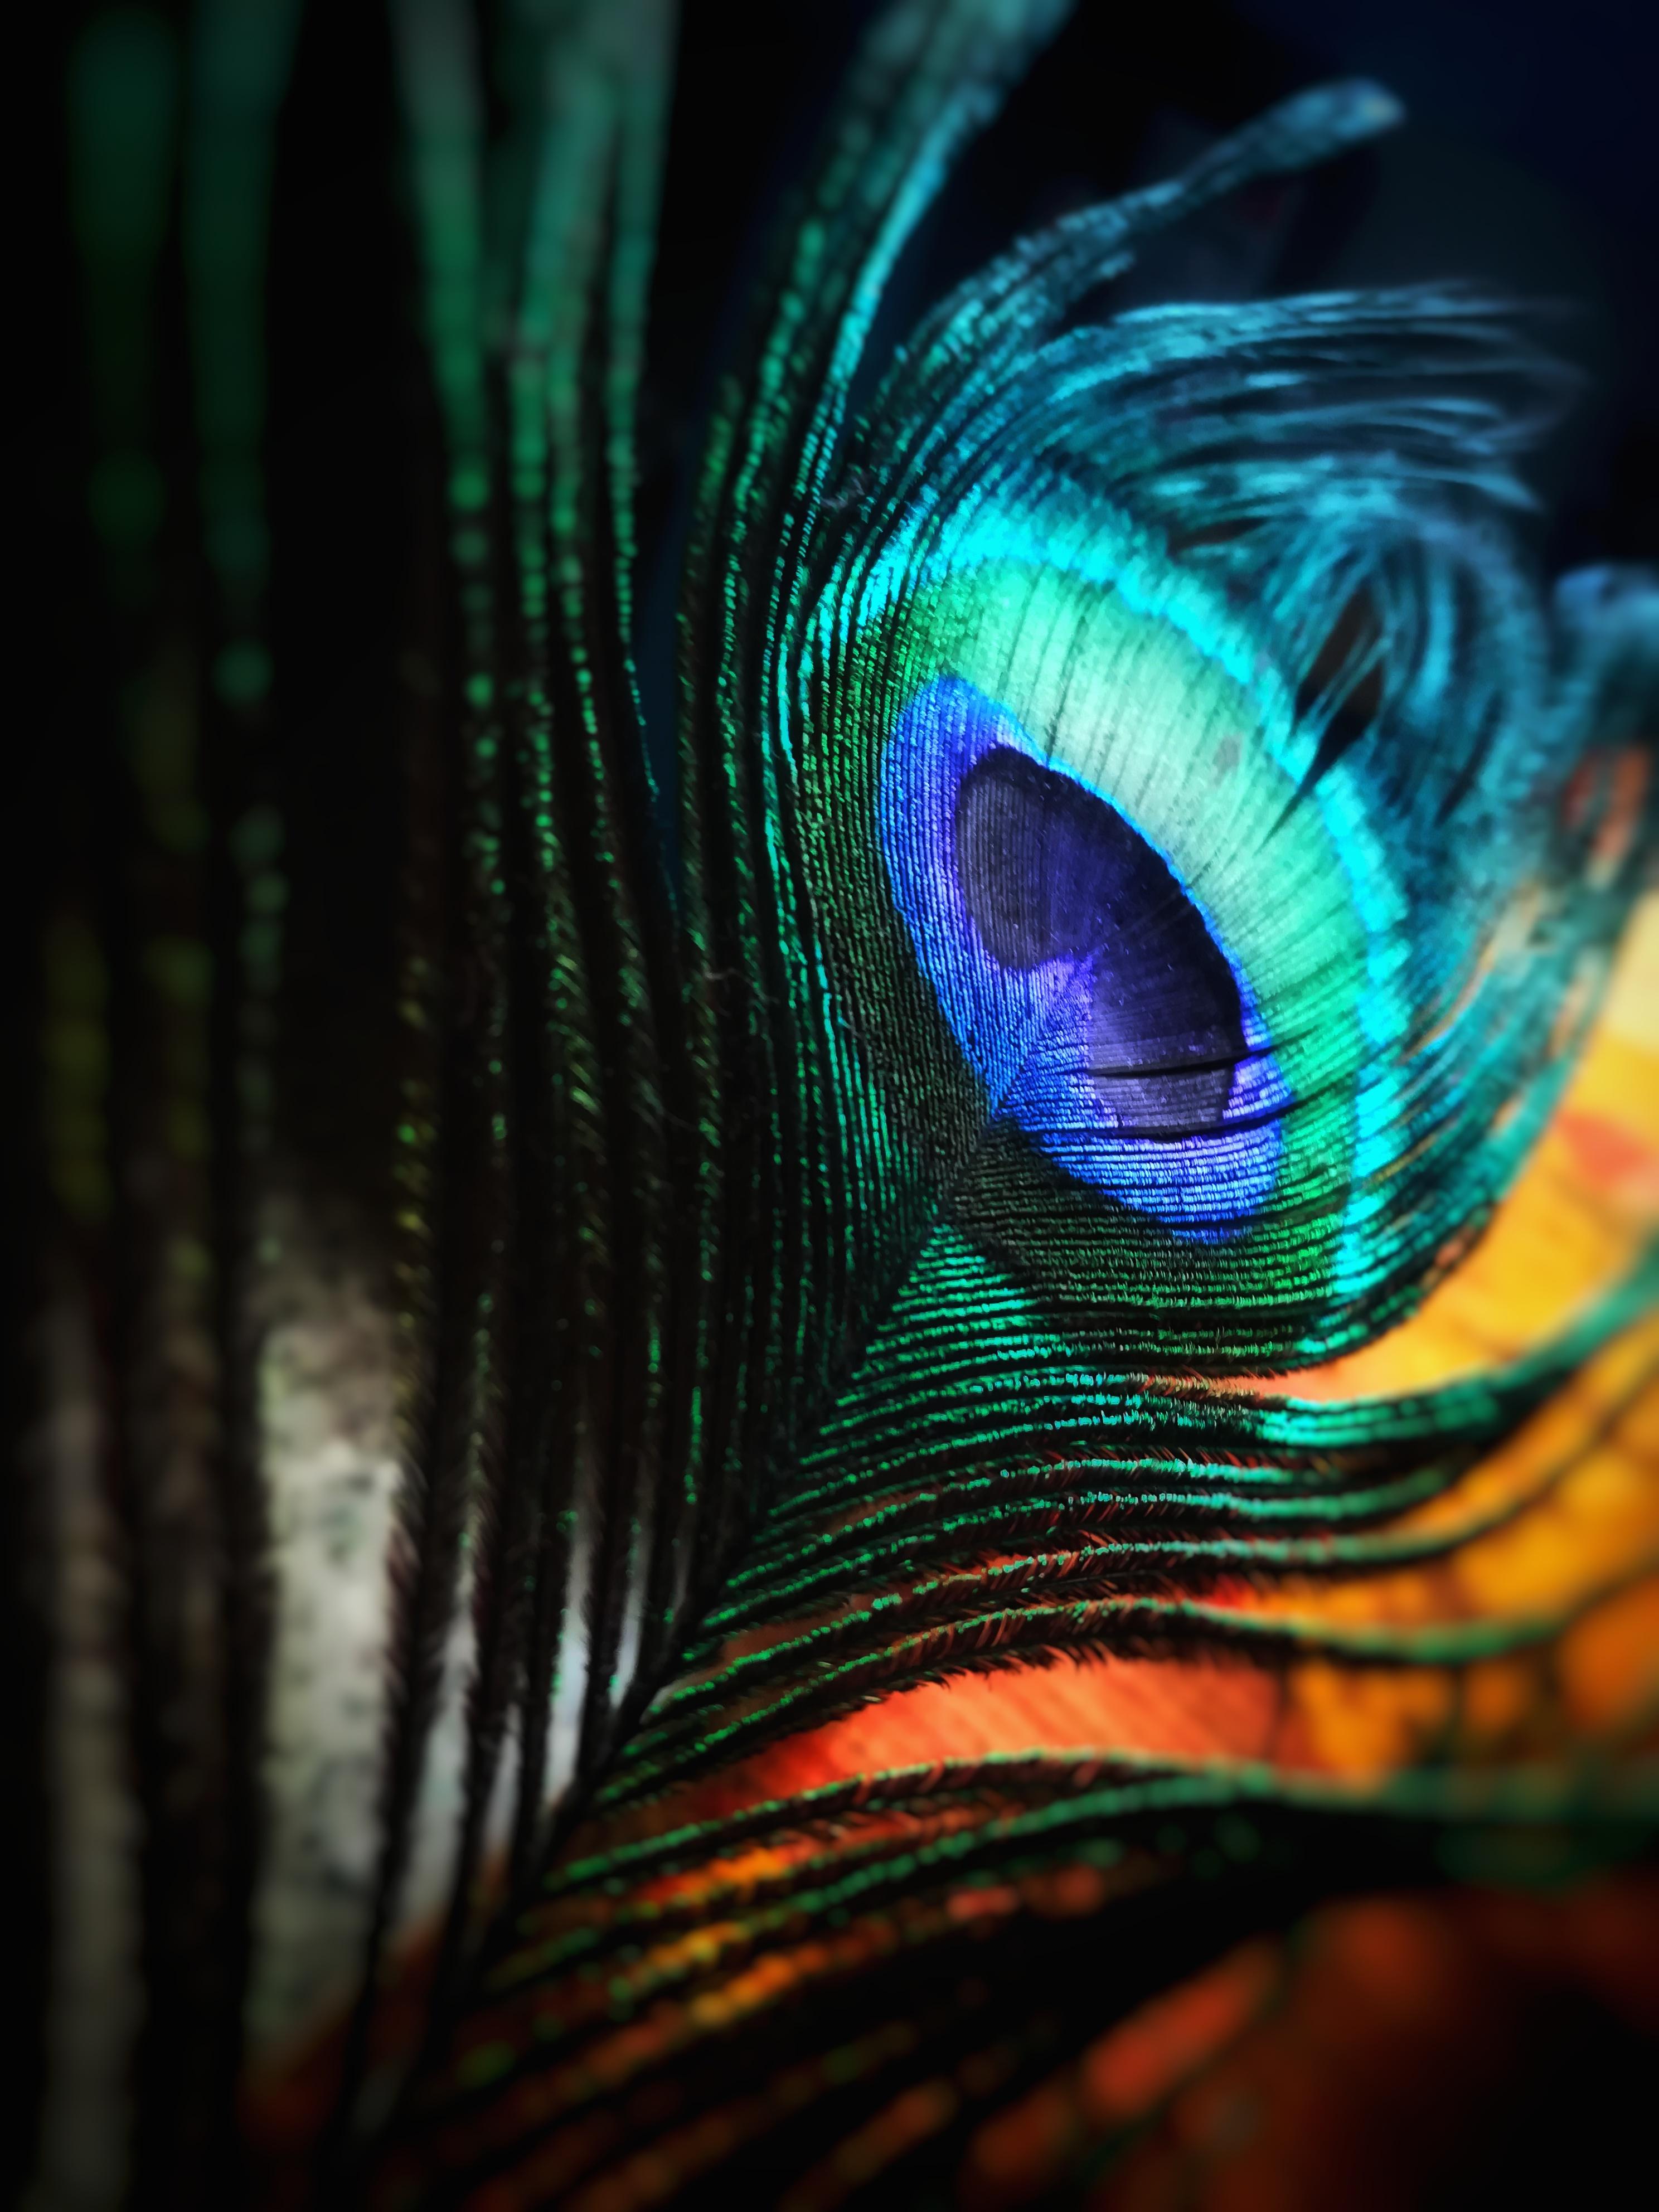 Peacock Feather (via Pexels)